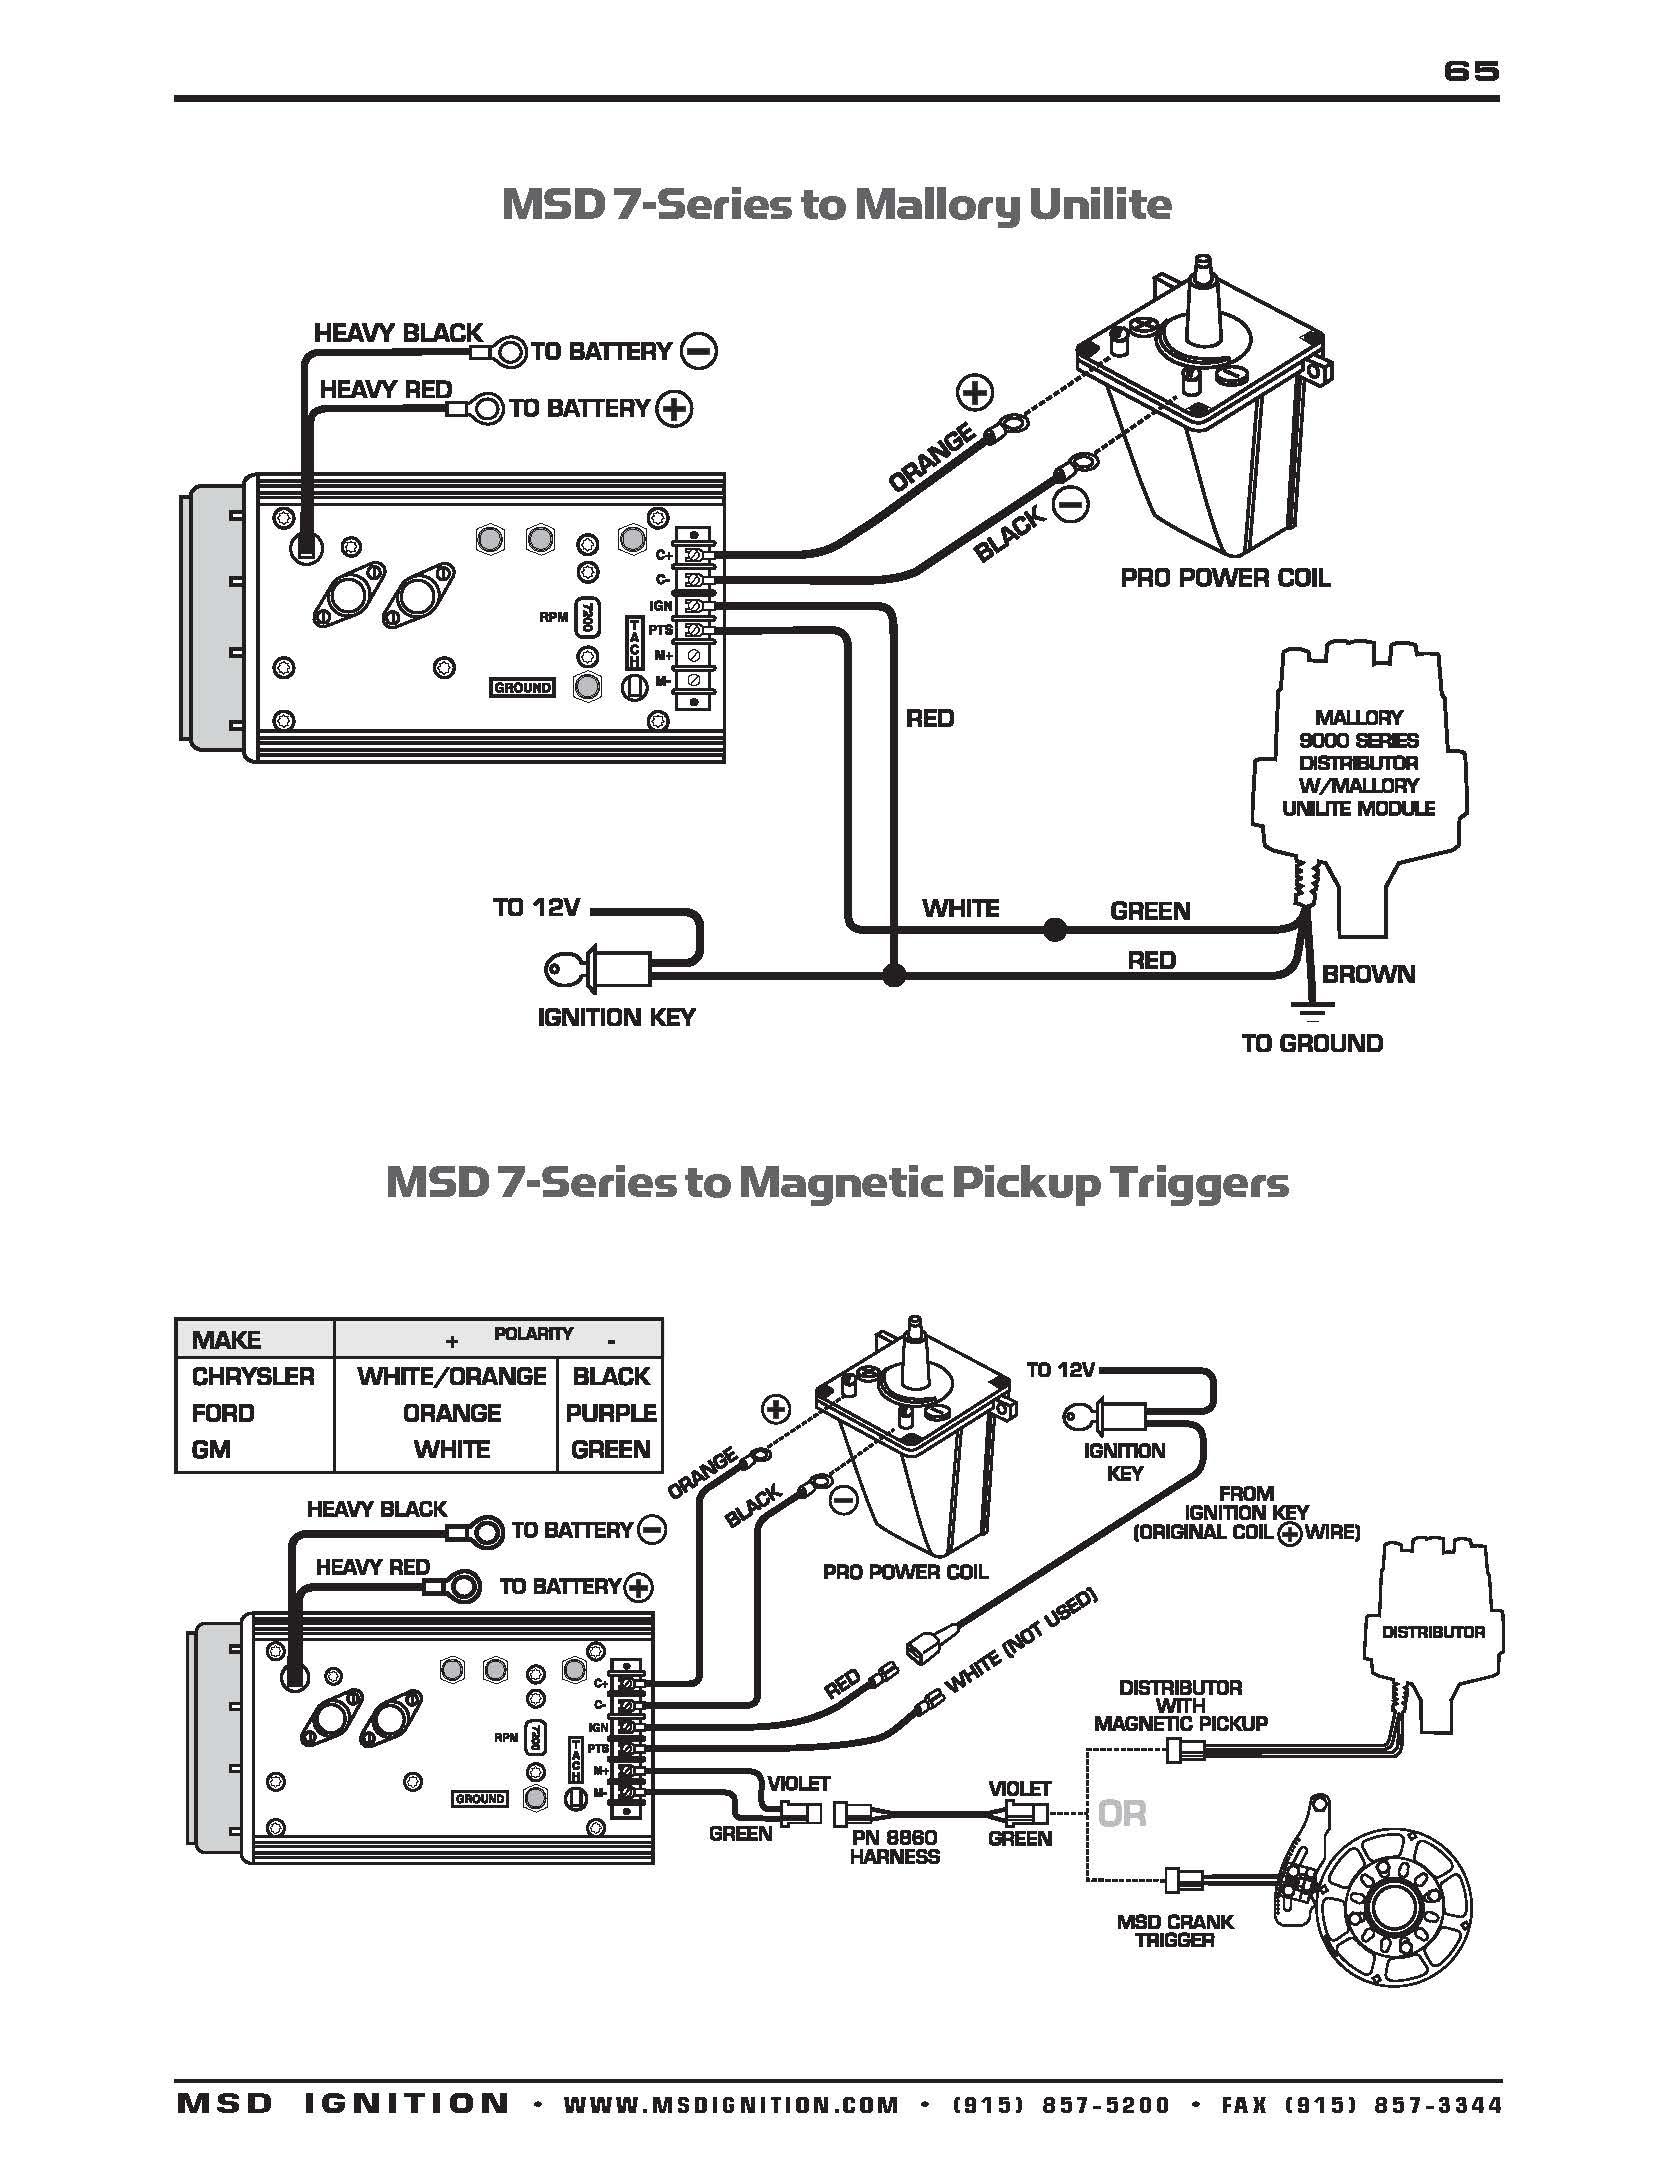 Mallory Unilite Wiring Diagram Sbc - Wiring Diagram Data Oreo - Ignition Wiring Diagram Chevy 350